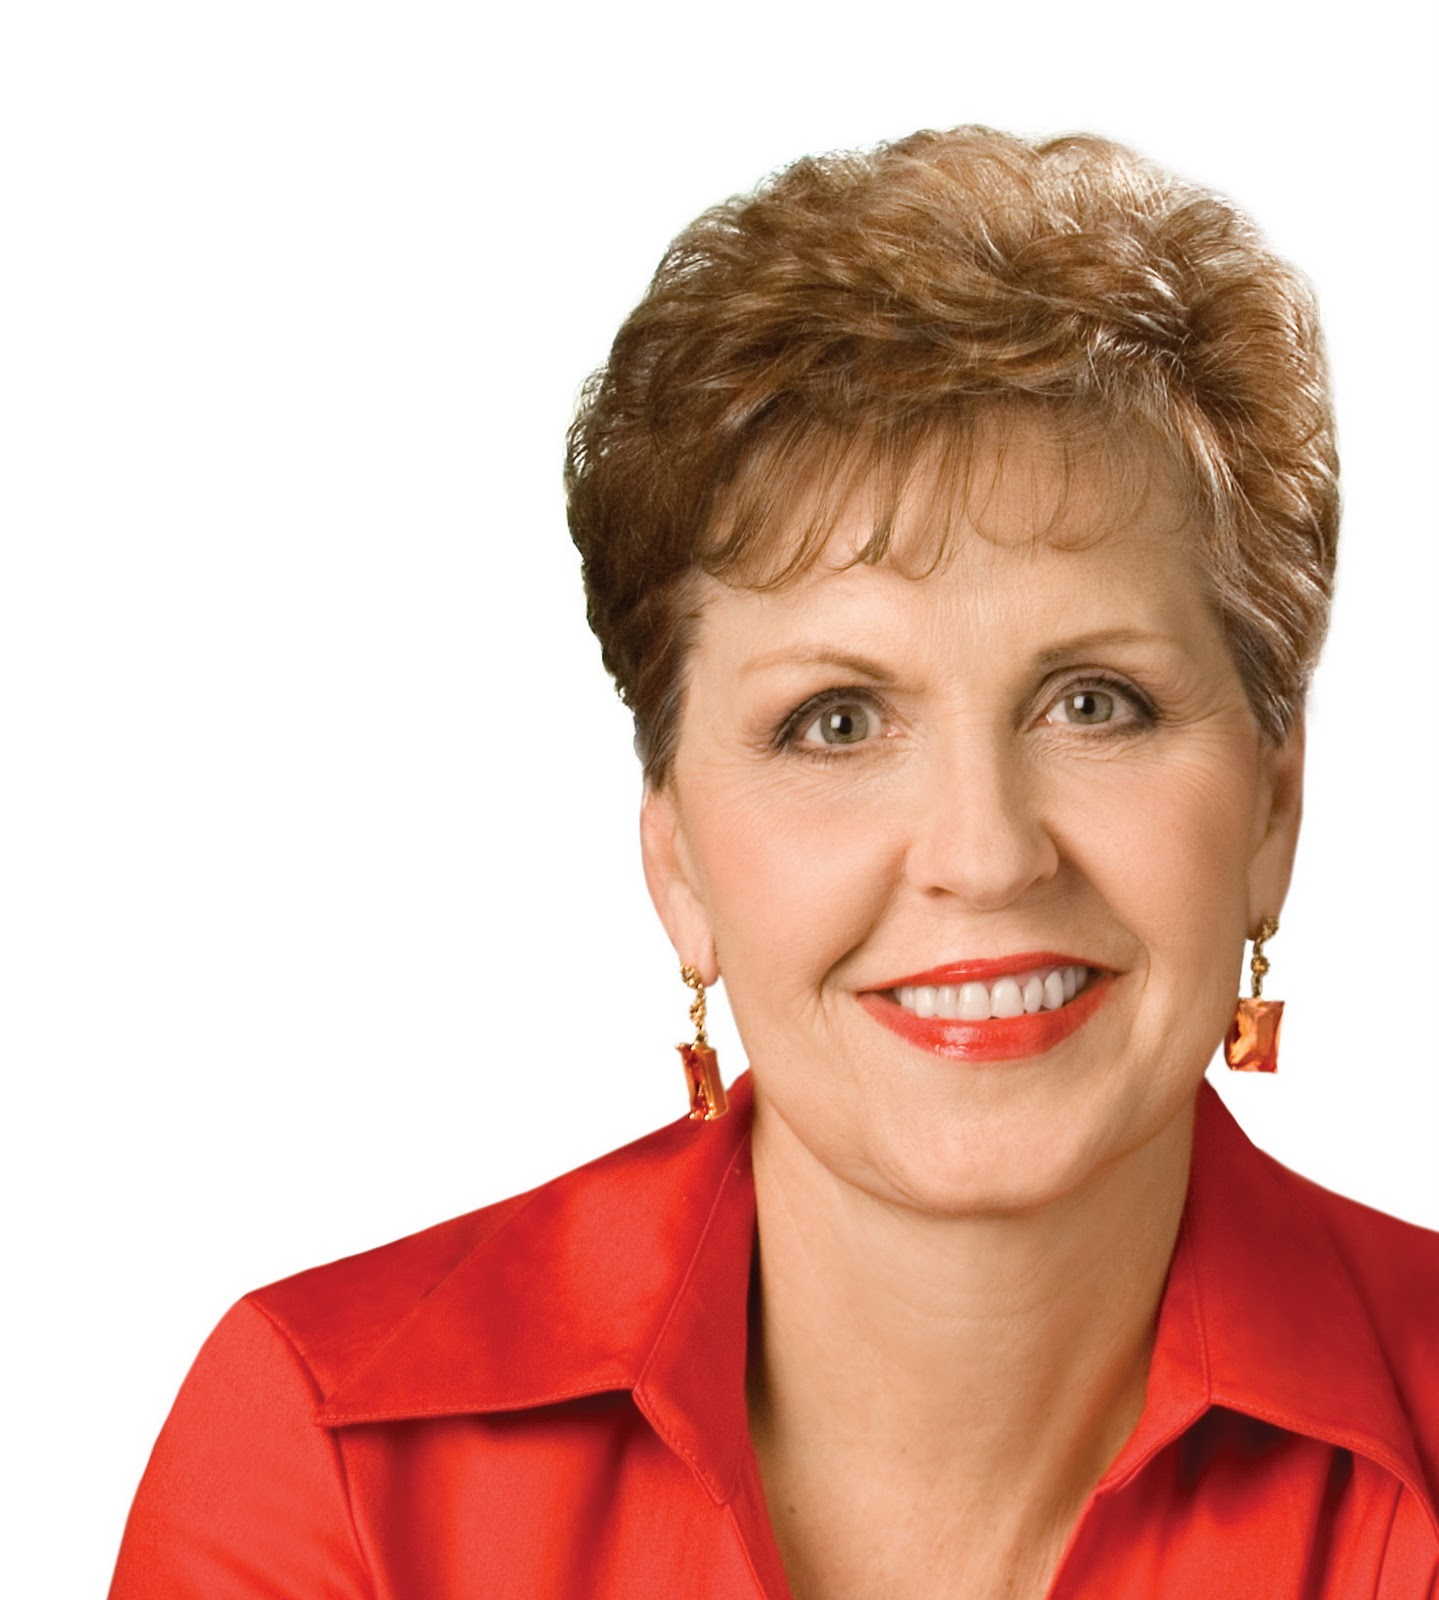 Joyce Meyer Net Worth